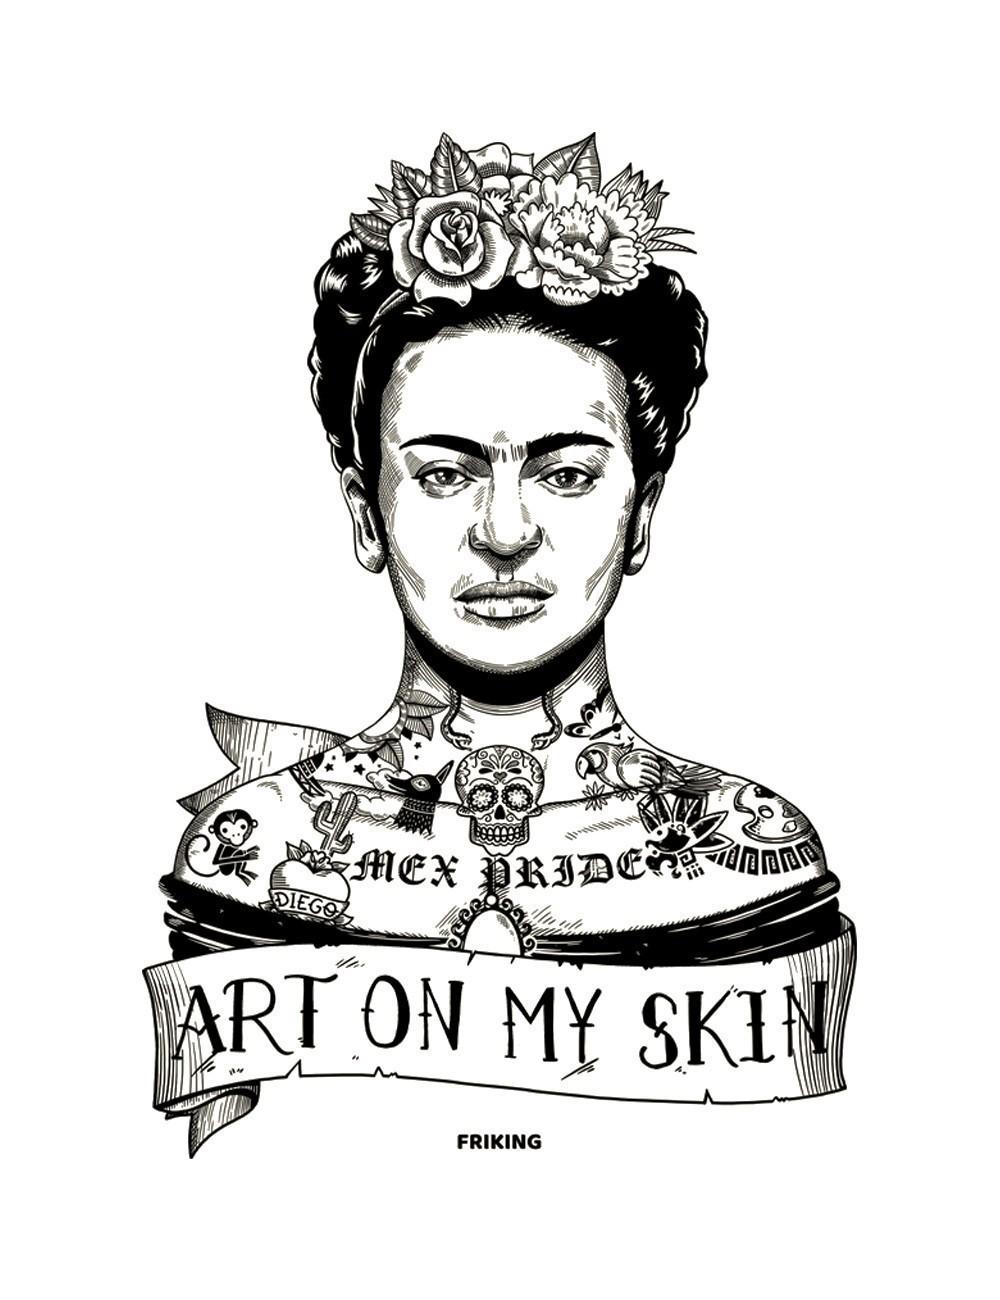 Art on my skin